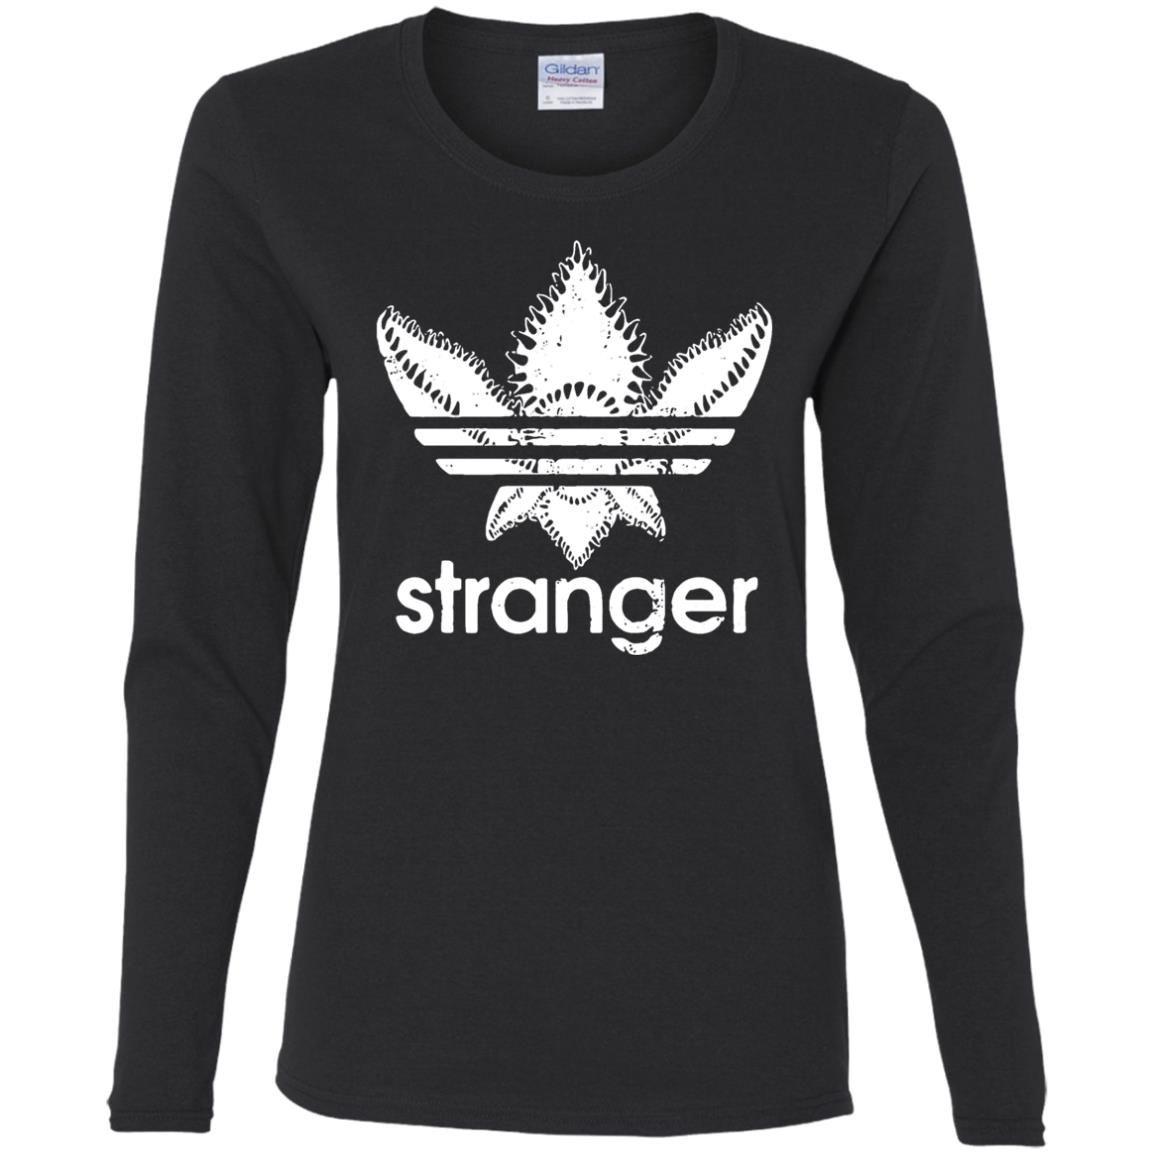 Adidas Demogorgon Stranger Things Women S Long Sleeve Zamrie Women Long Sleeve Demogorgon Stranger Things Long Sleeve [ 1155 x 1155 Pixel ]